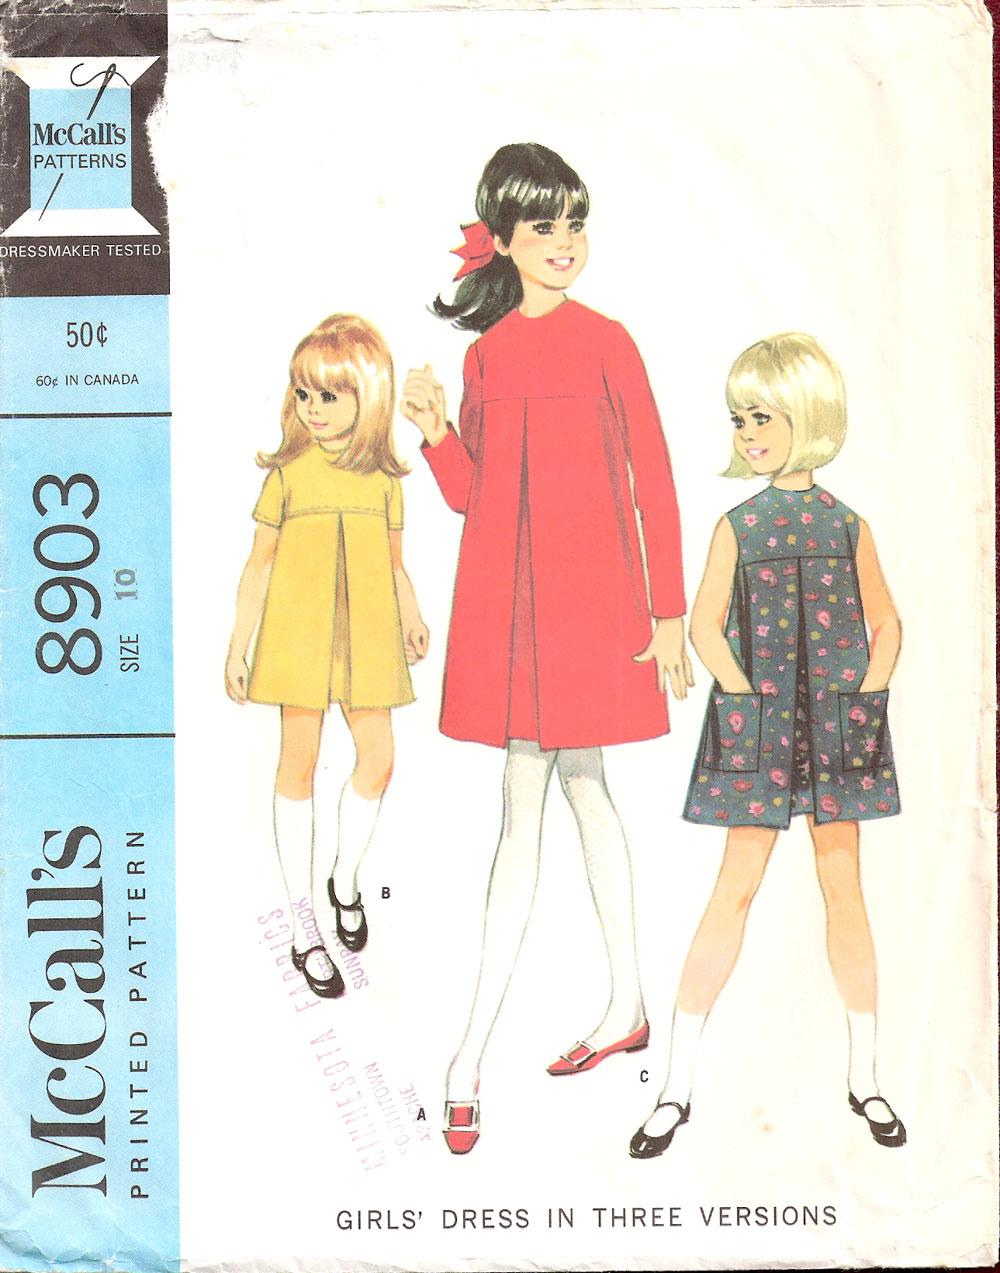 McCall's 8903